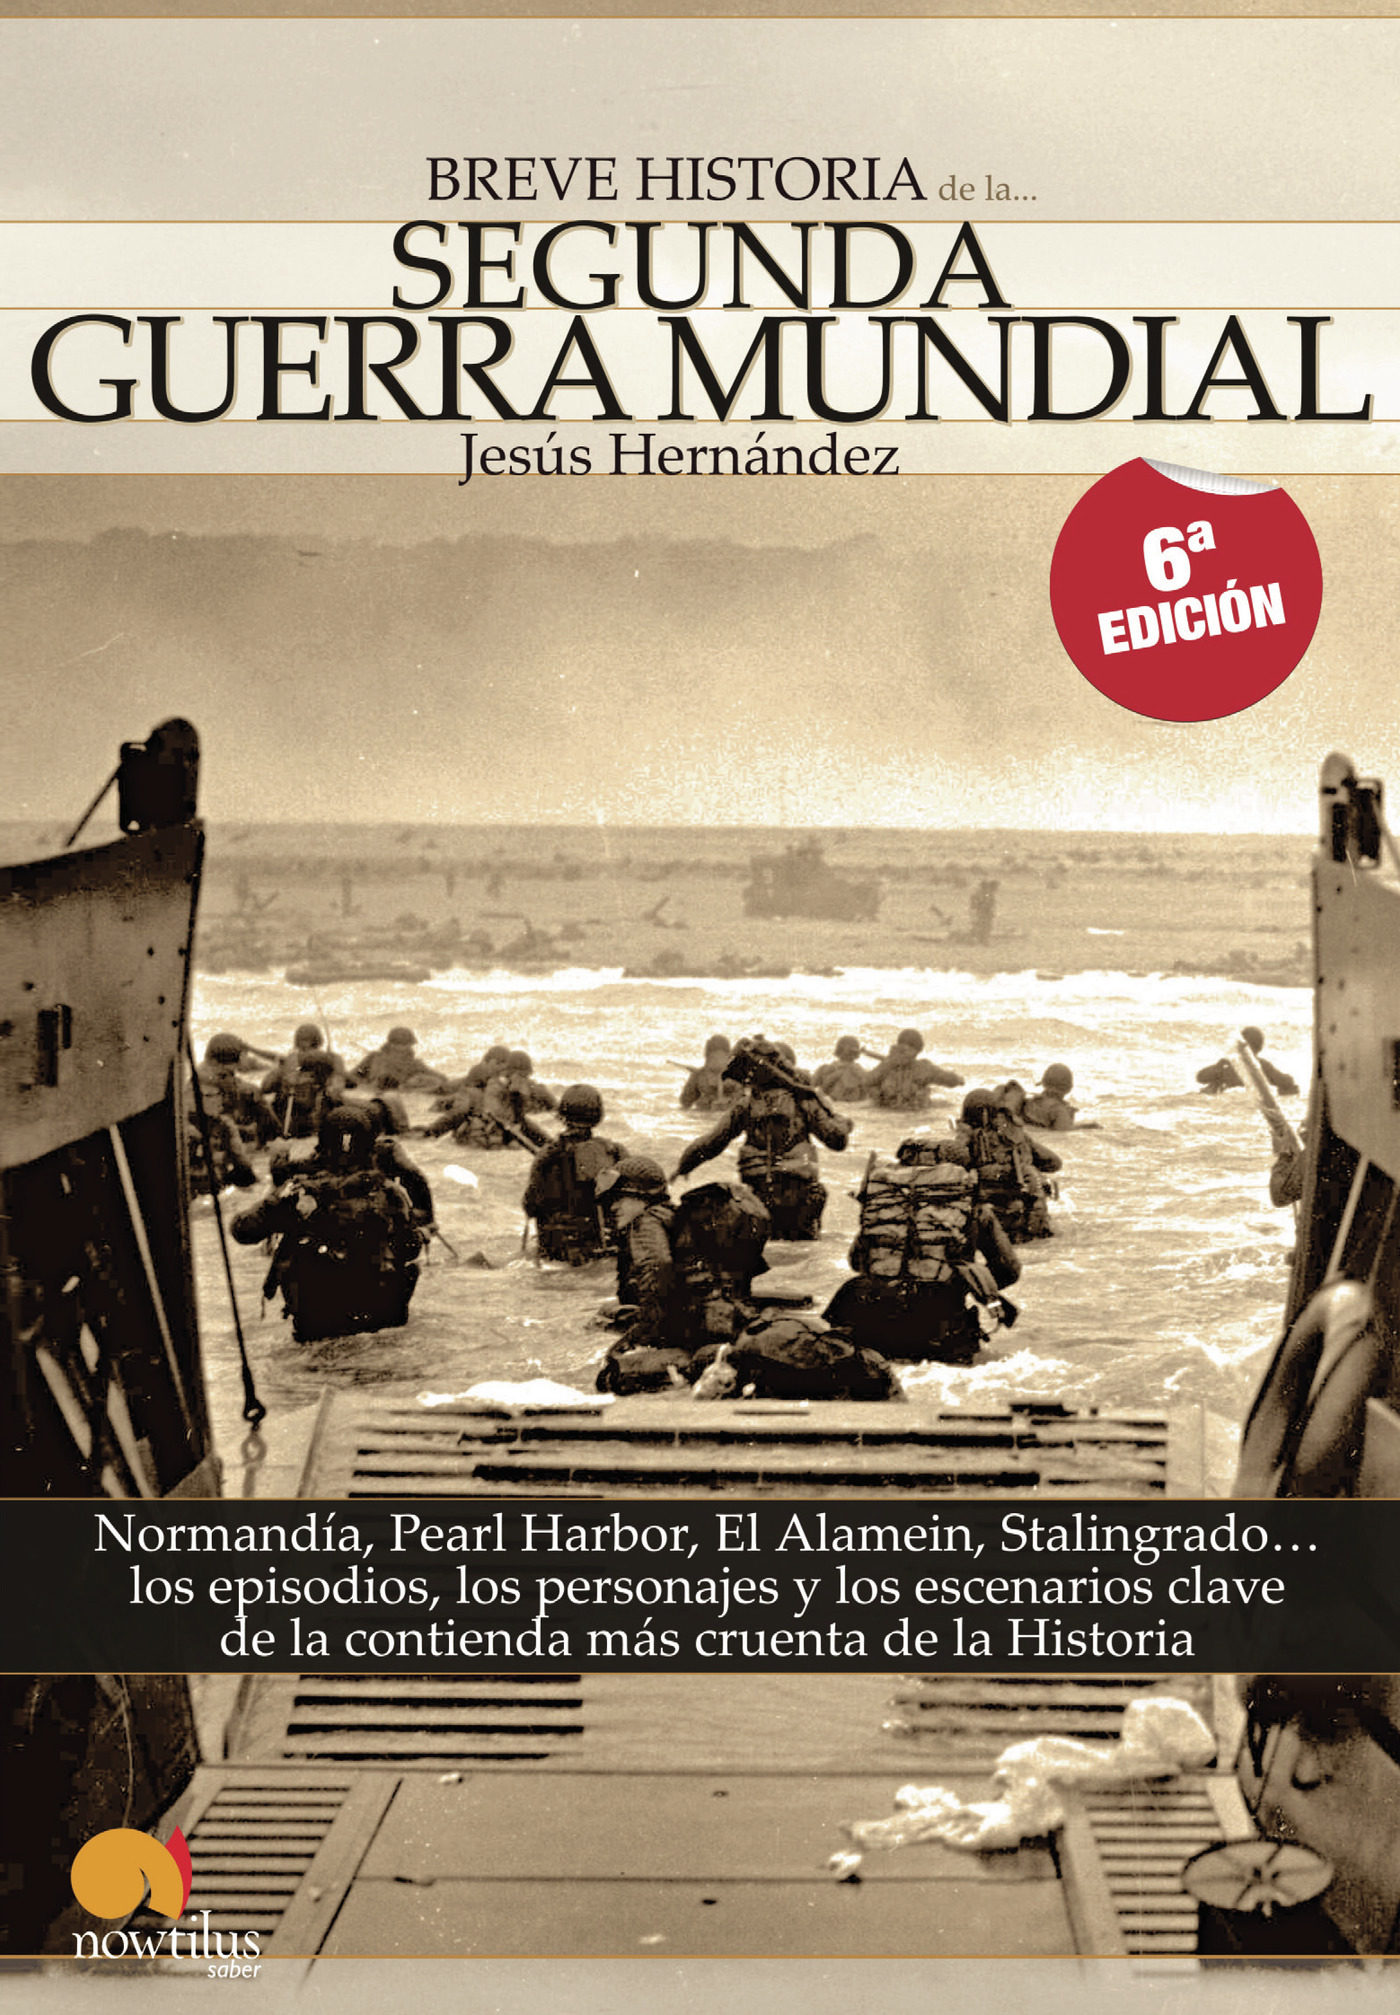 Breve Historia De La Segunda Guerra Mundial Jesus Hernandez